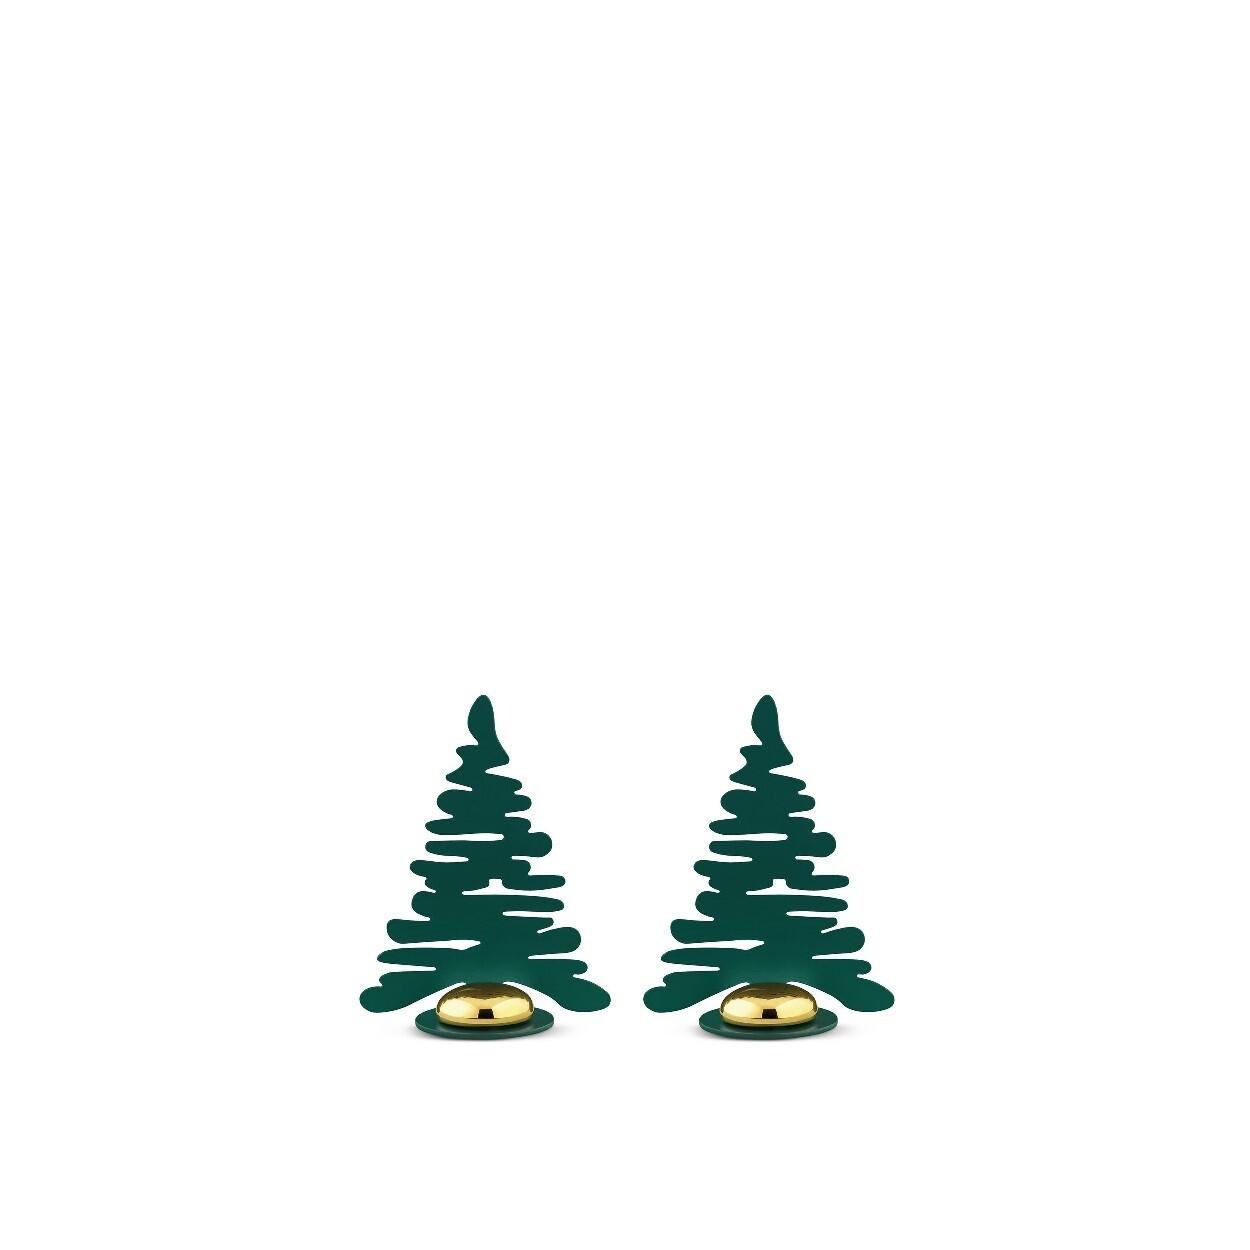 ALESSI 'bark for christmas' set/2 metalen naam- of fotohouders groen met vergulde magneet